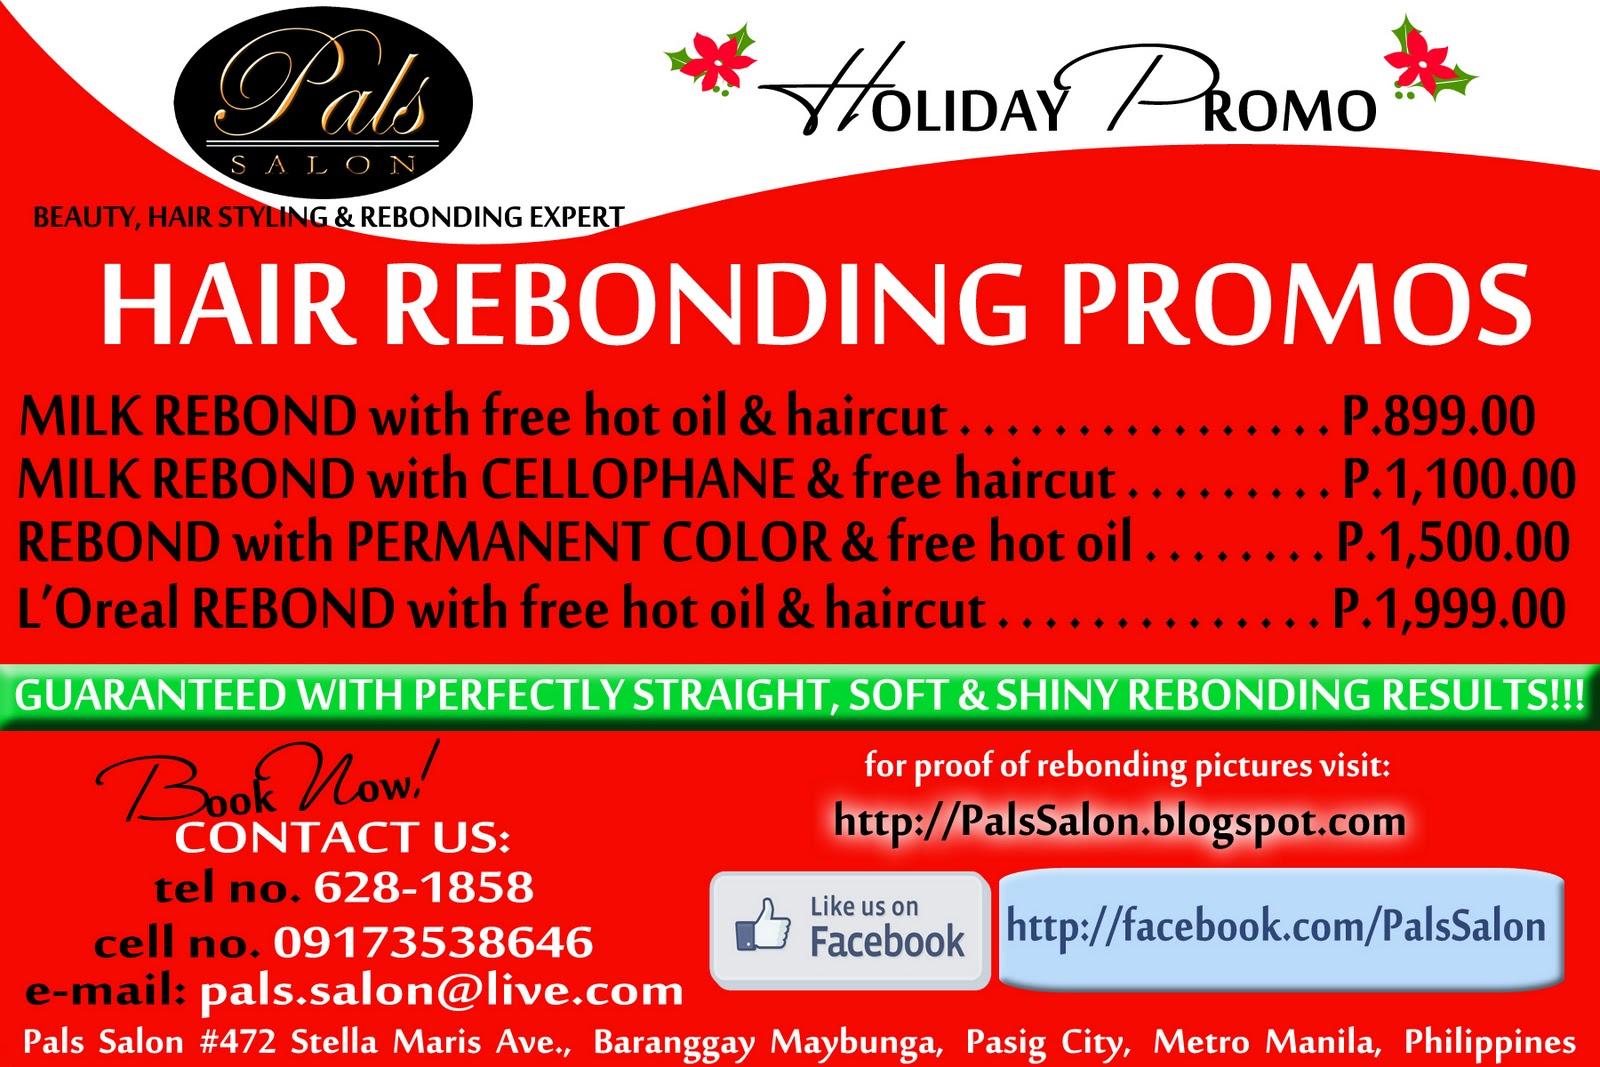 pals salon pals salon holiday promo. Black Bedroom Furniture Sets. Home Design Ideas